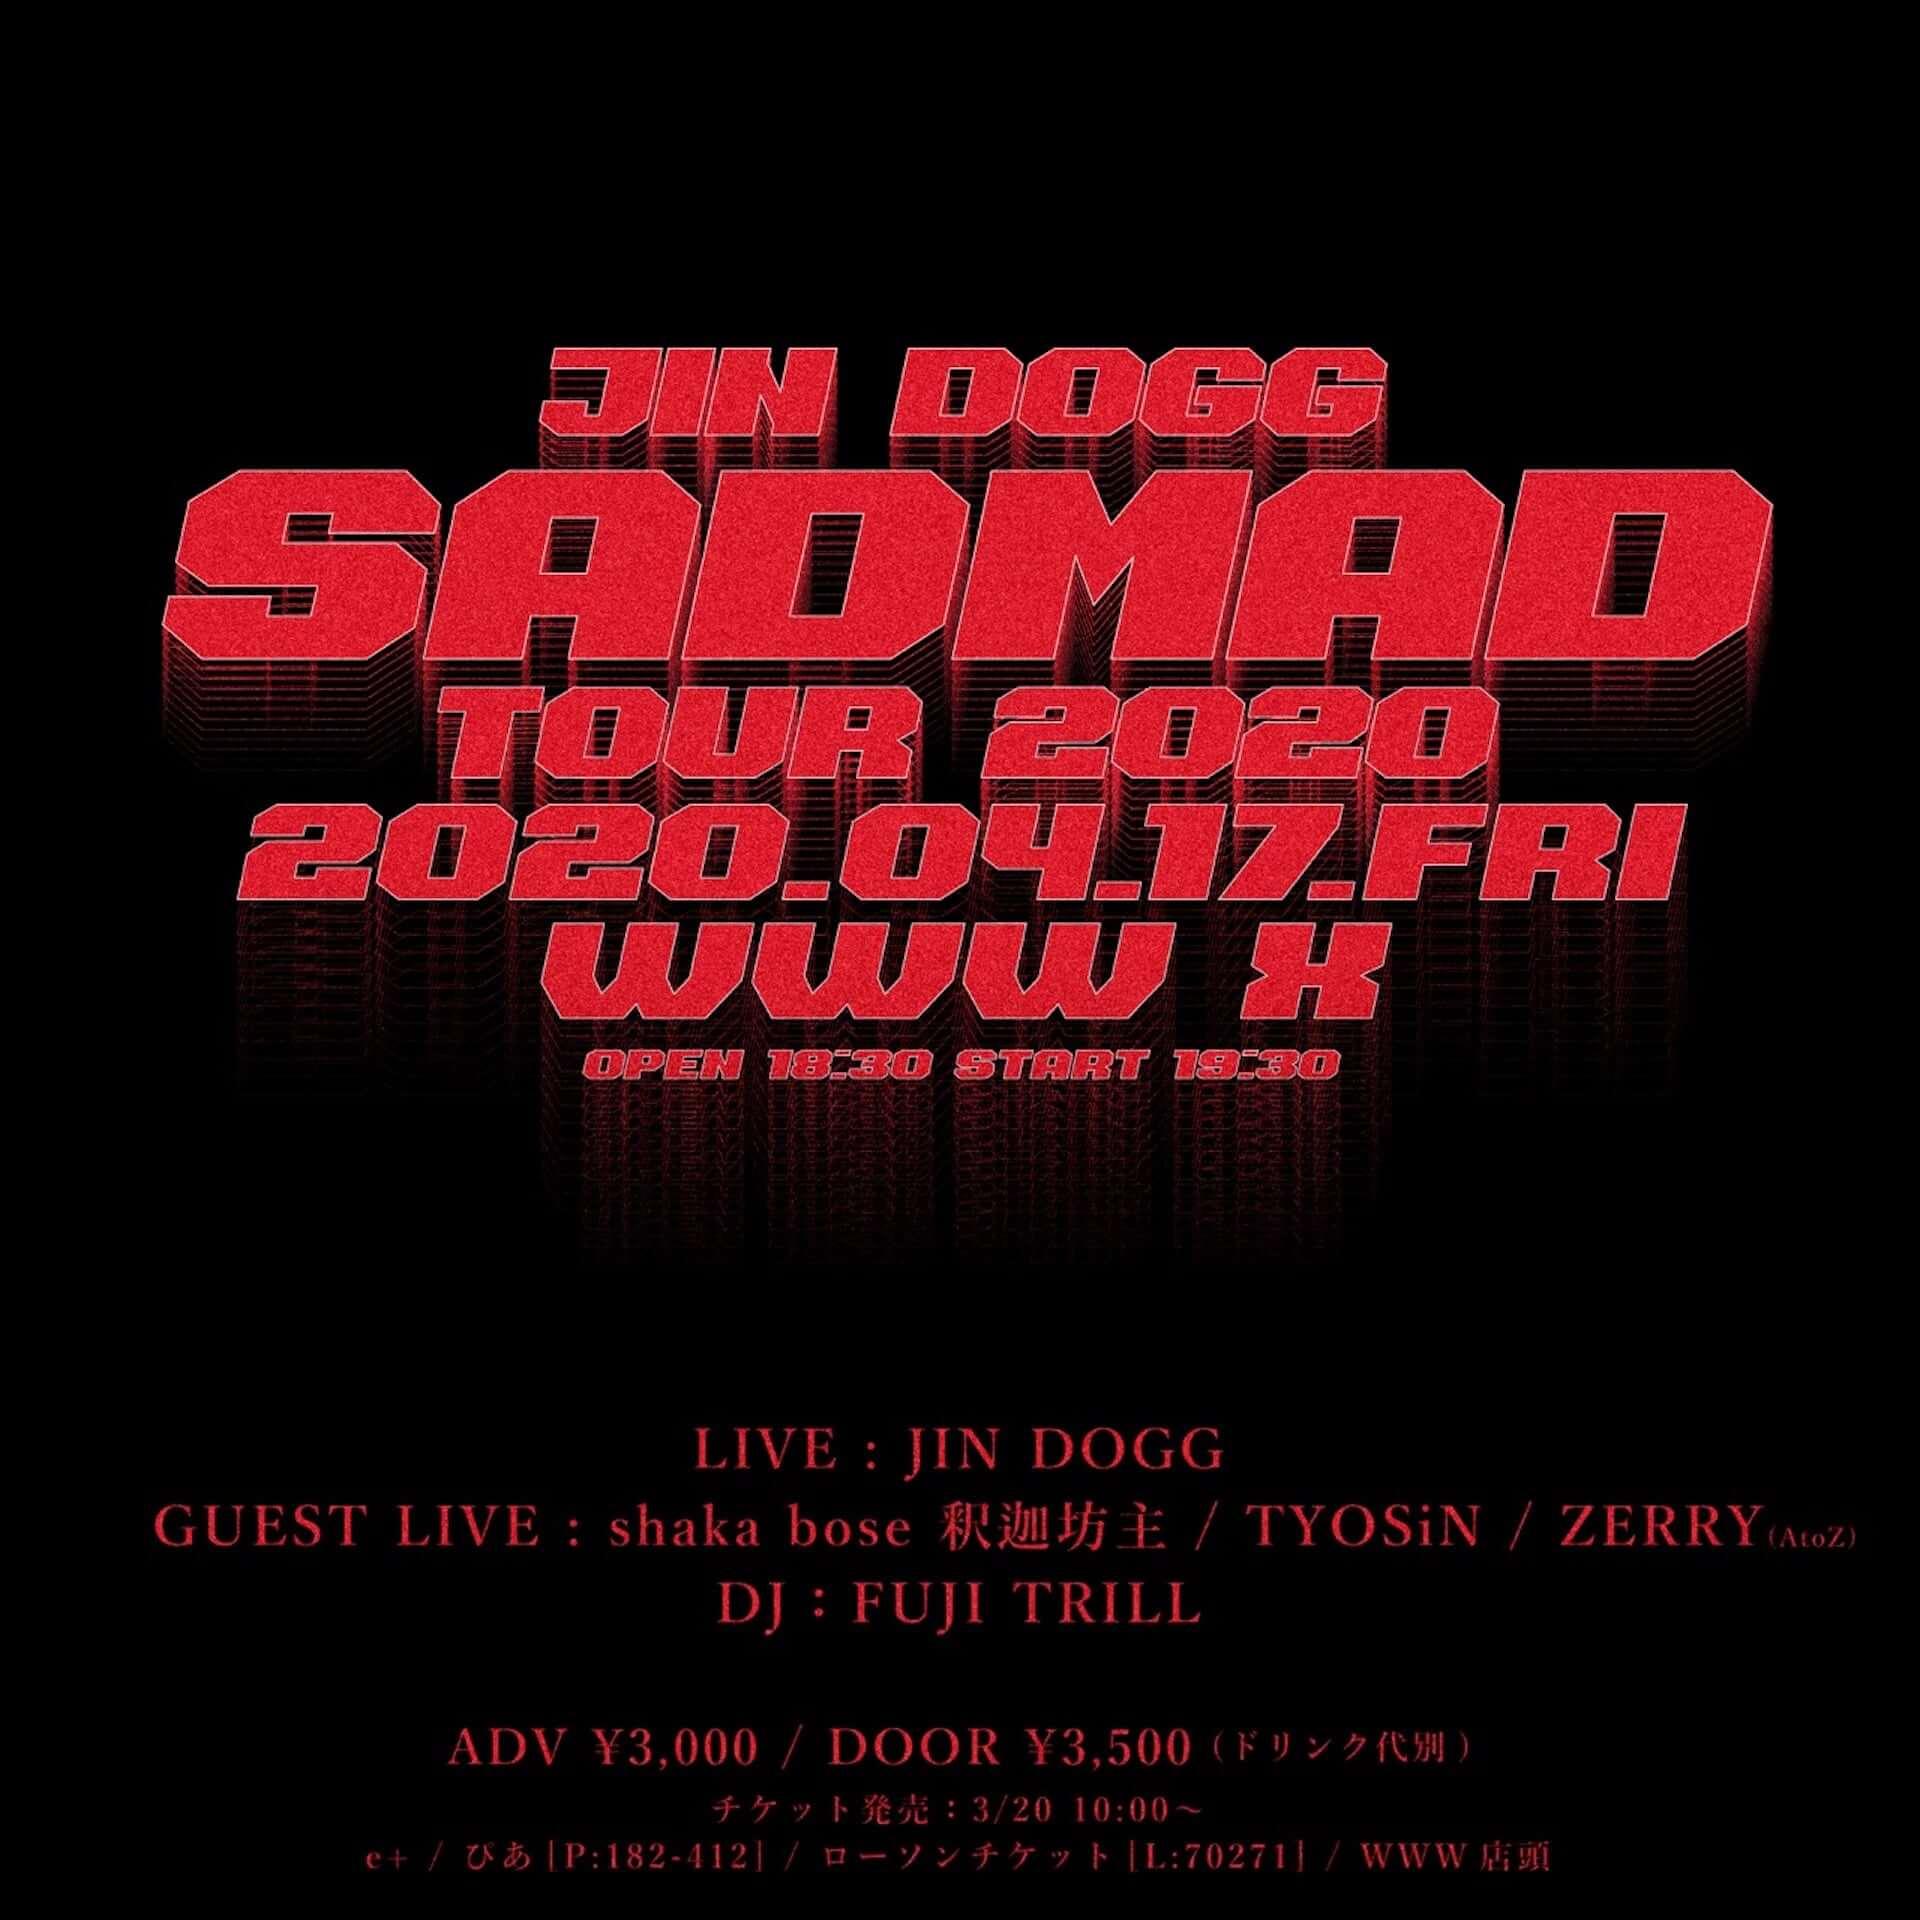 JIN DOGGの2部作『SAD JAKE』『MAD JAKE』のリリースパーティーに釈迦坊主、TYOSiN、ZERRYらが出演決定 music200318_jindogg_sadmad_4-1920x1920